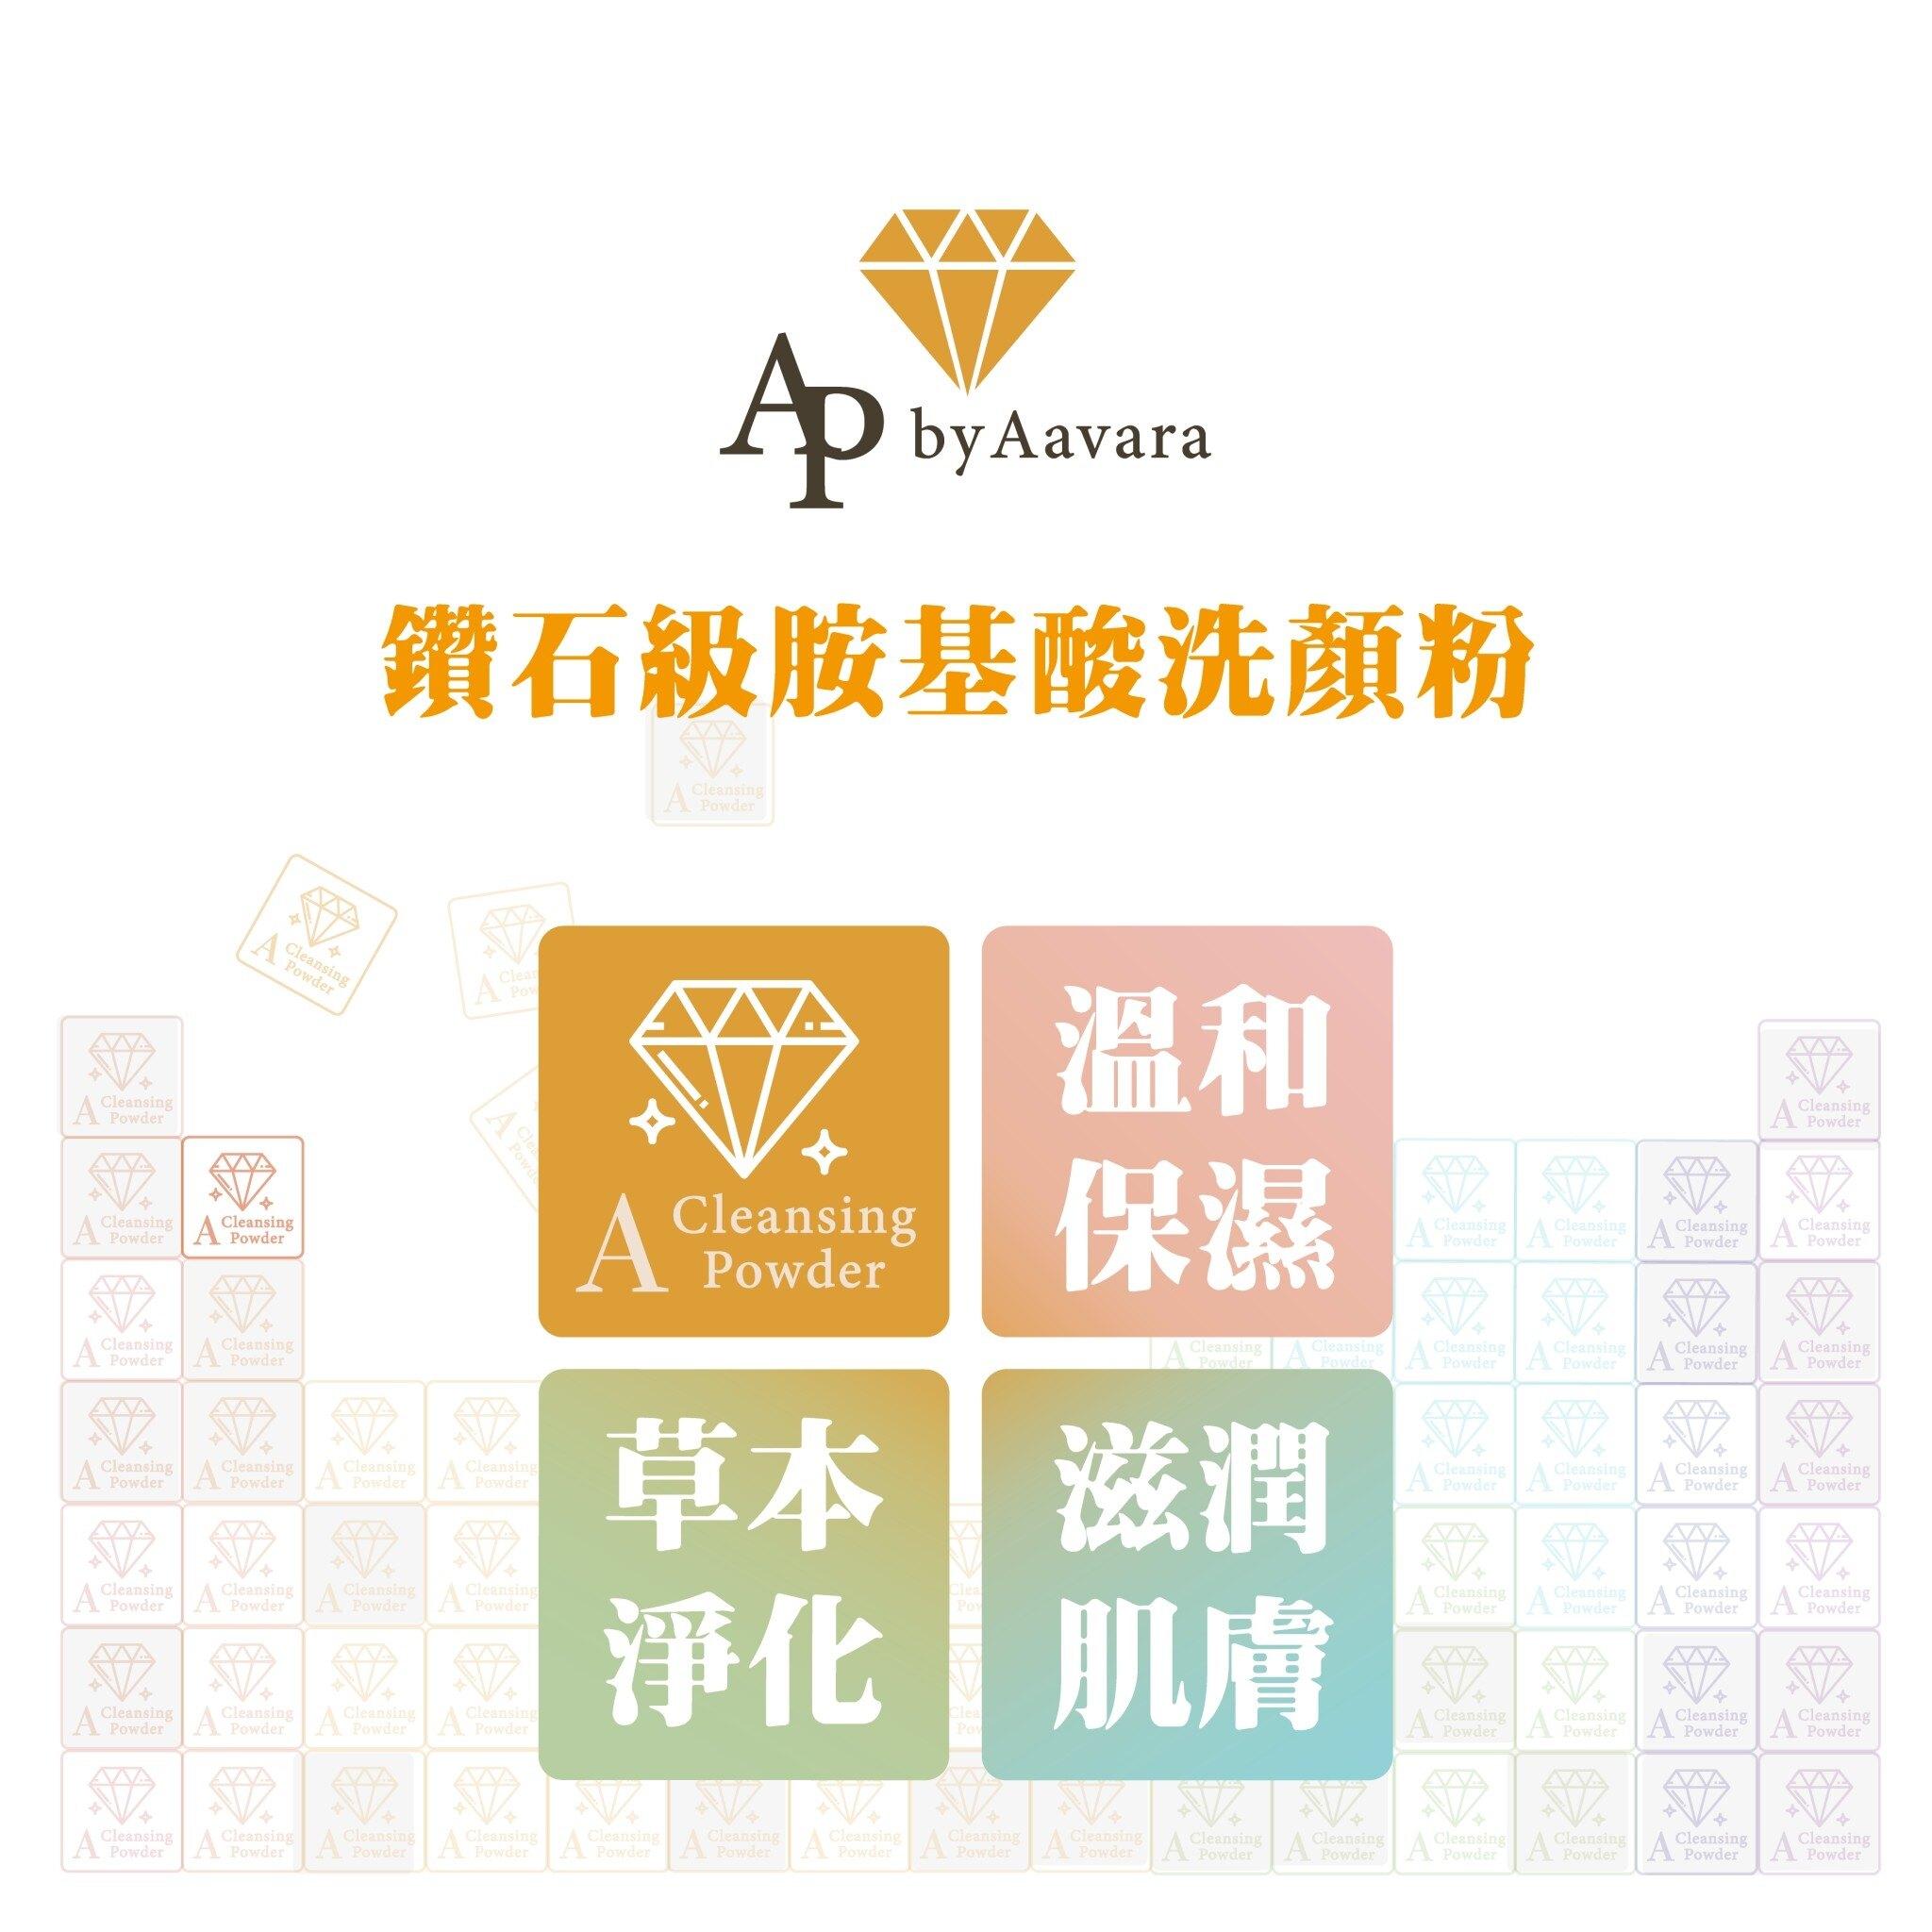 【Aavara】AP鑽白胺基酸洗顏粉 0.4g x 32